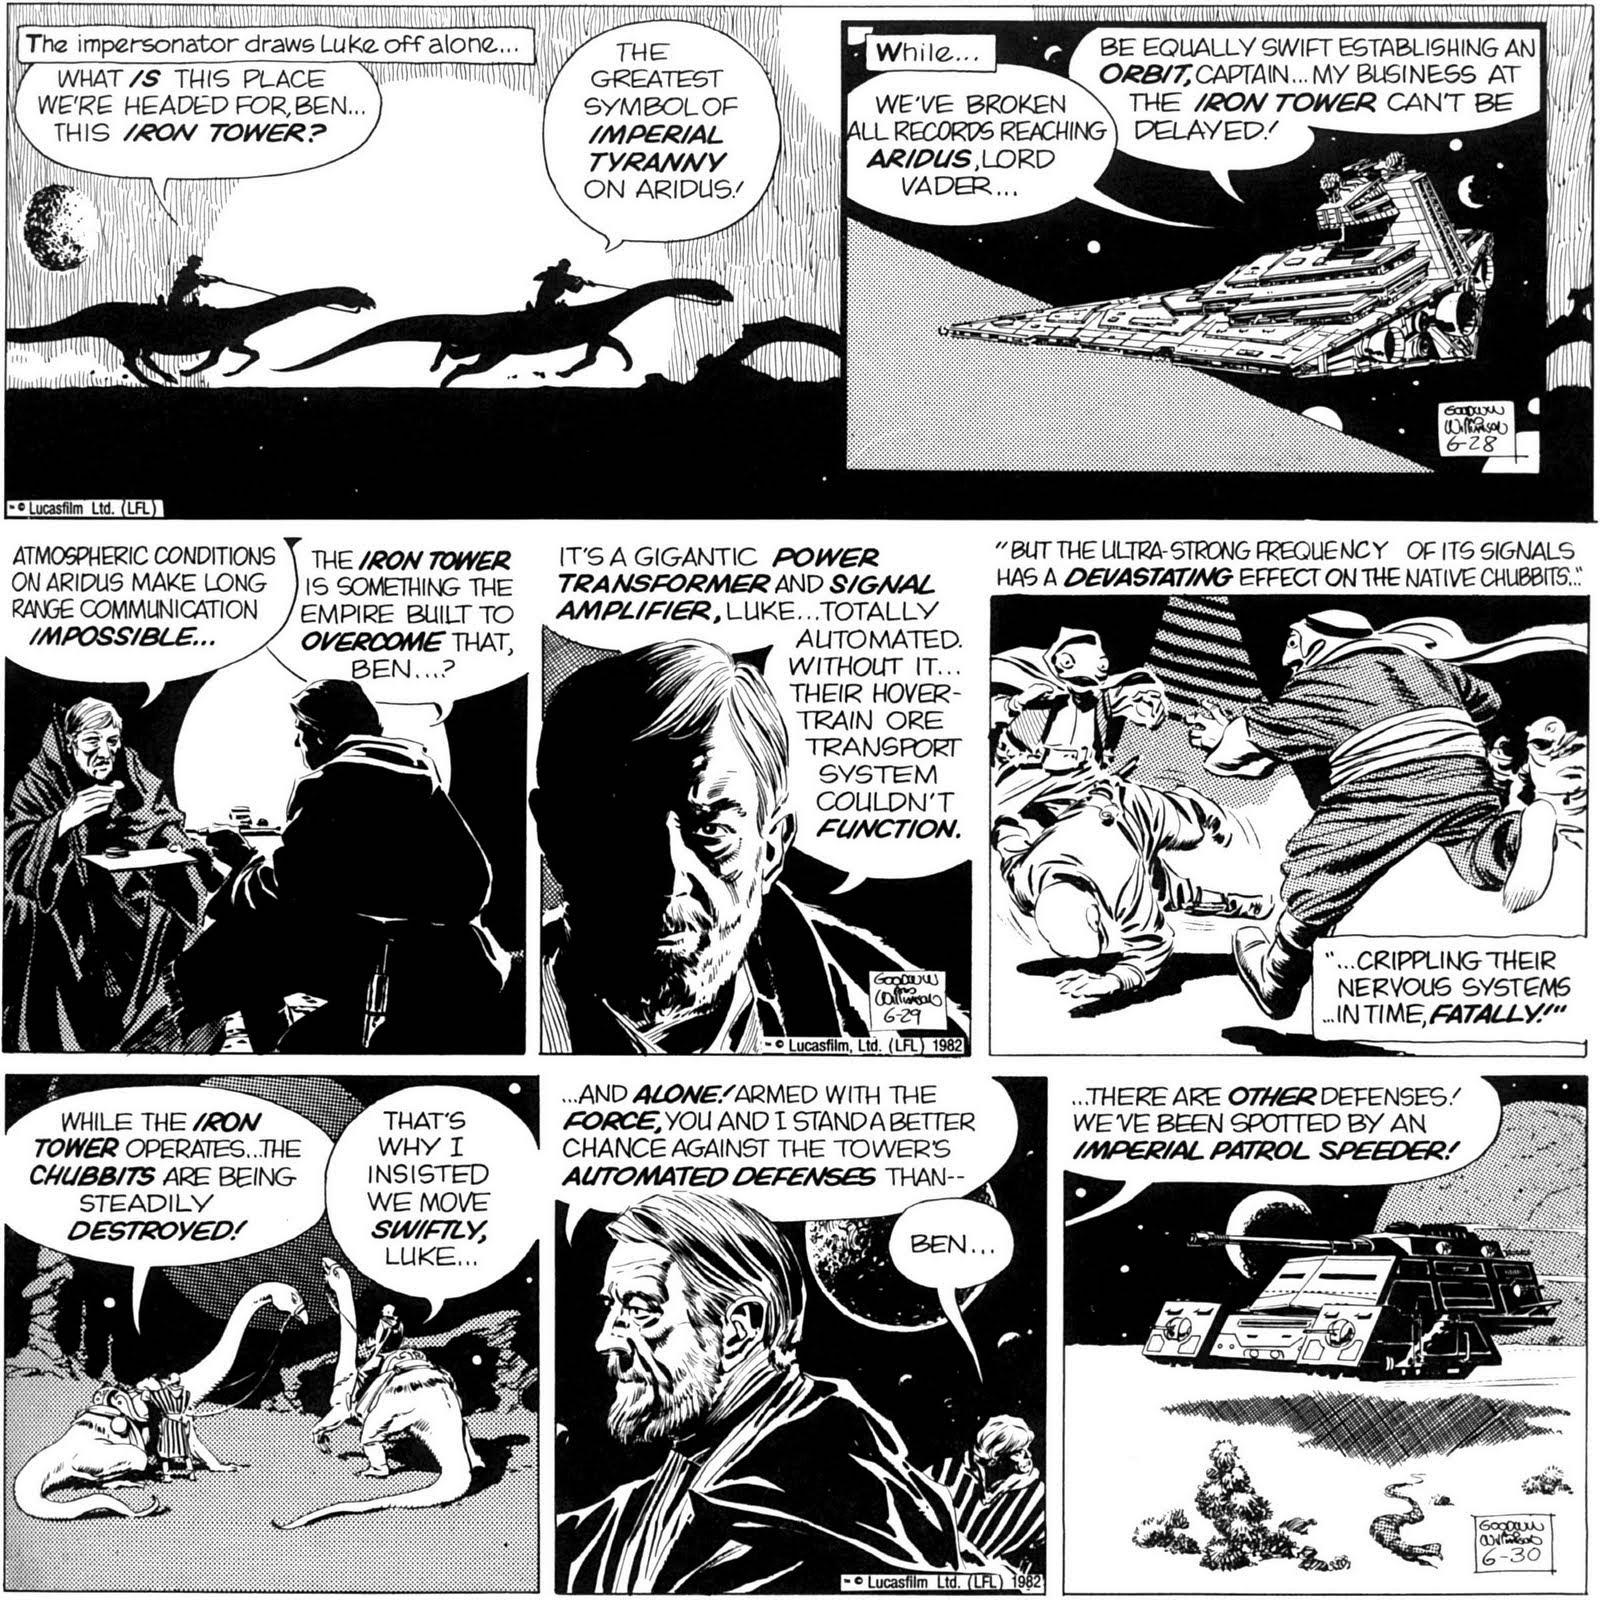 O gajo de culos star wars press strips de al williamson for Planeta de agostini r2d2